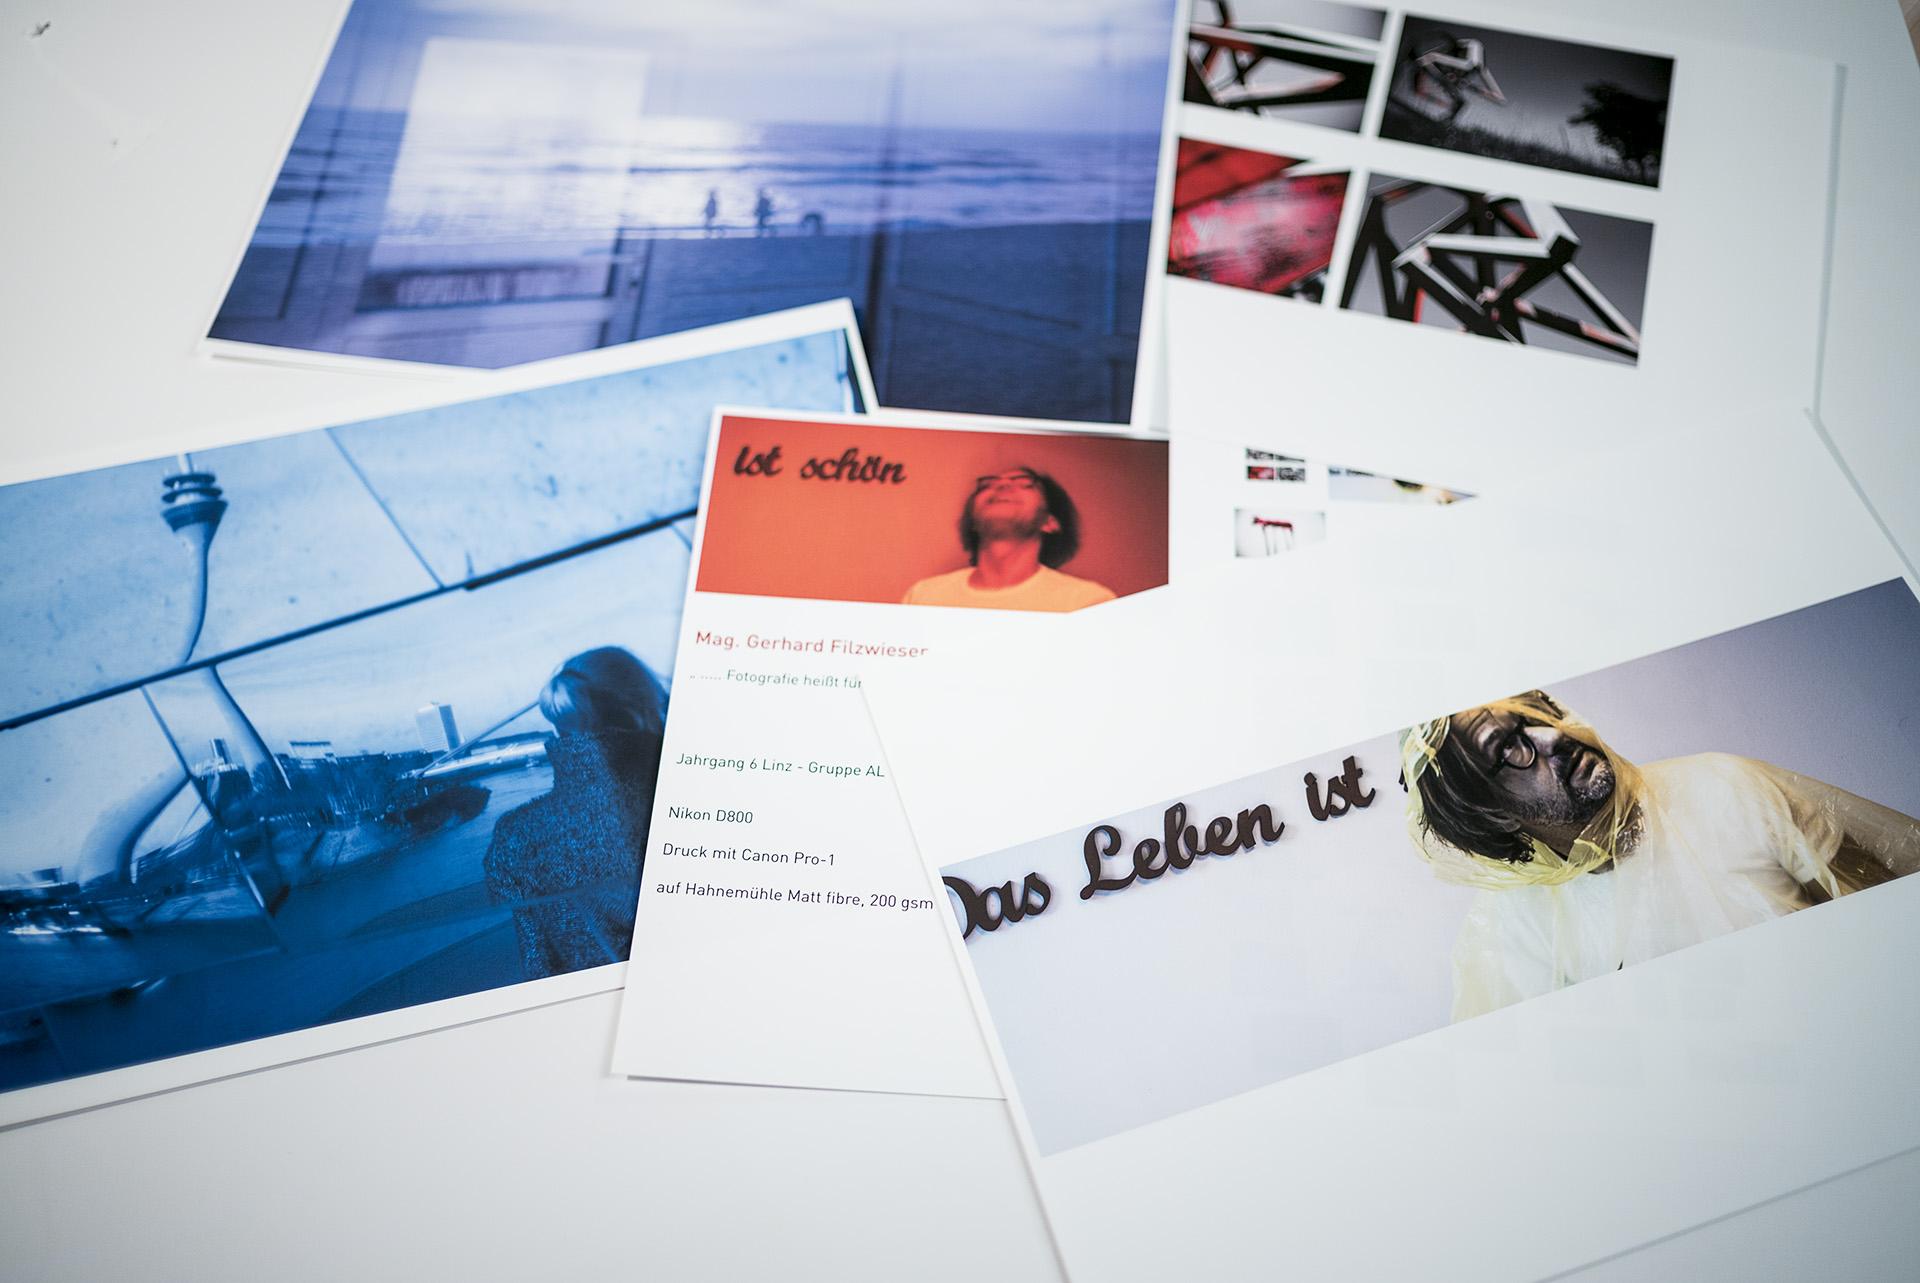 Fotos copyright by Gerhard Filzwieser